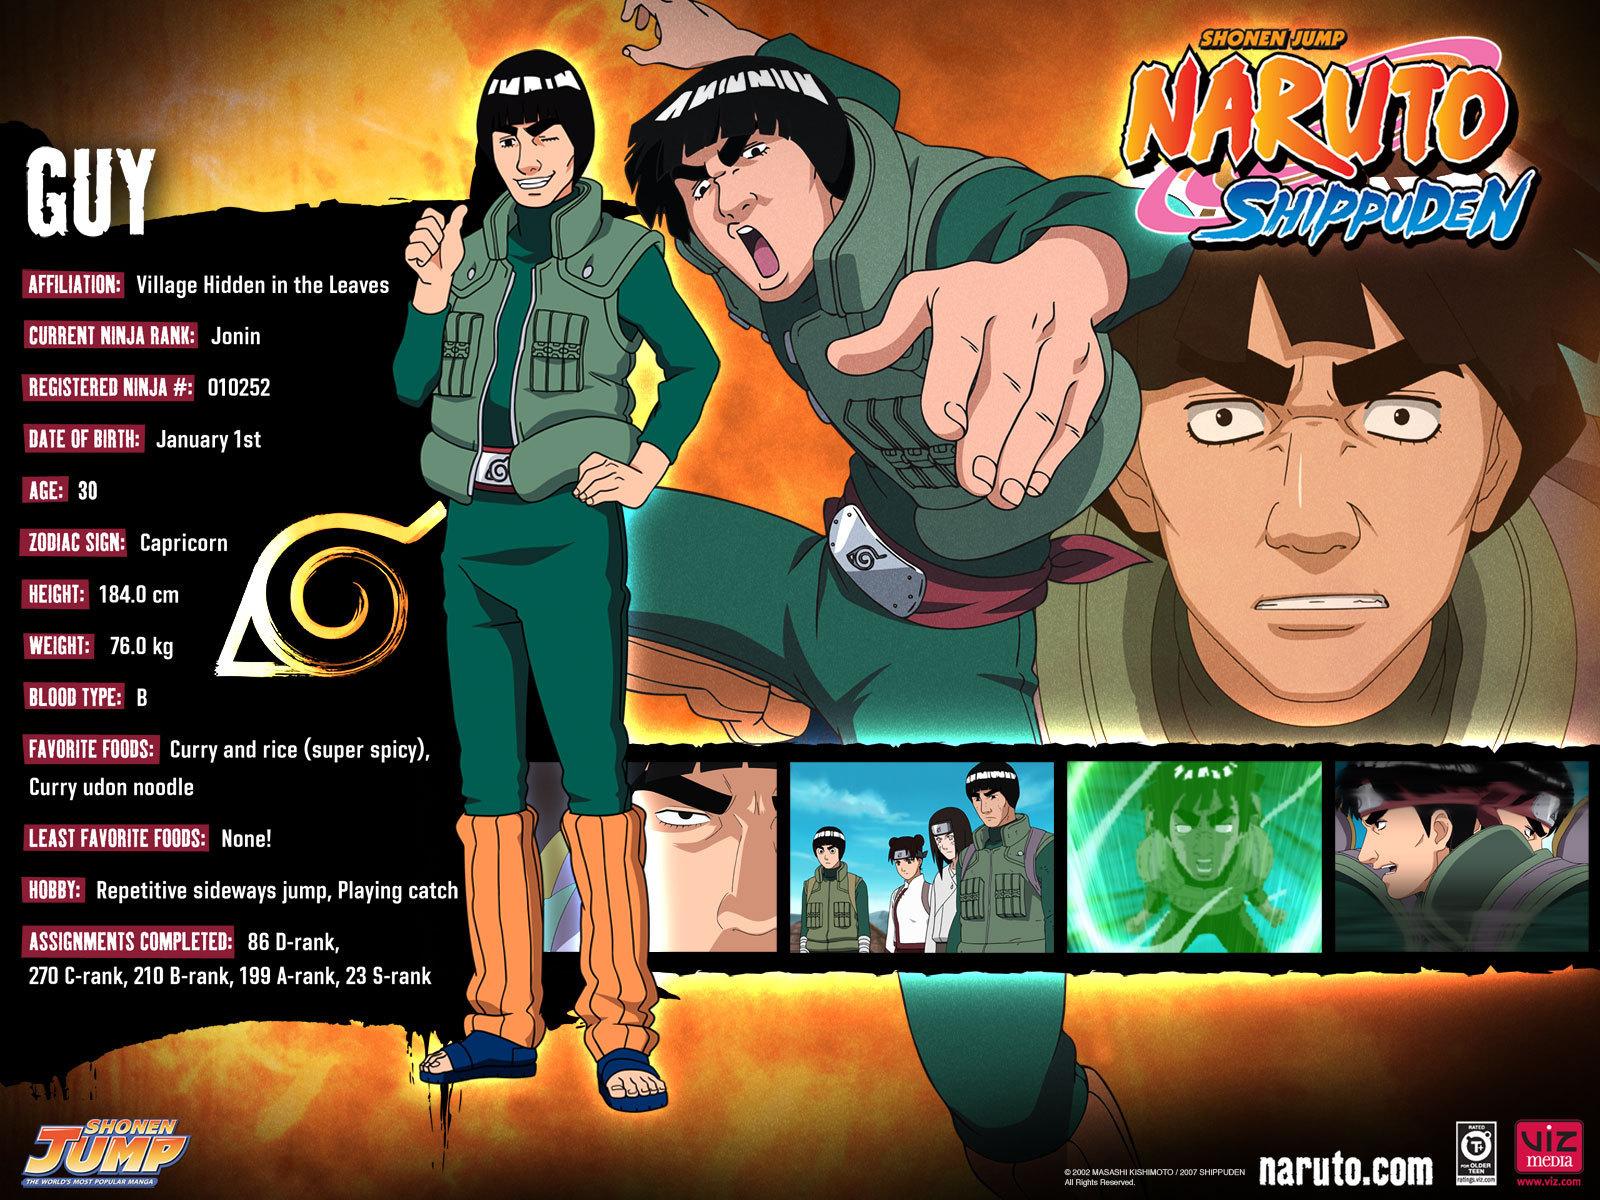 Naruto wallpaper free download